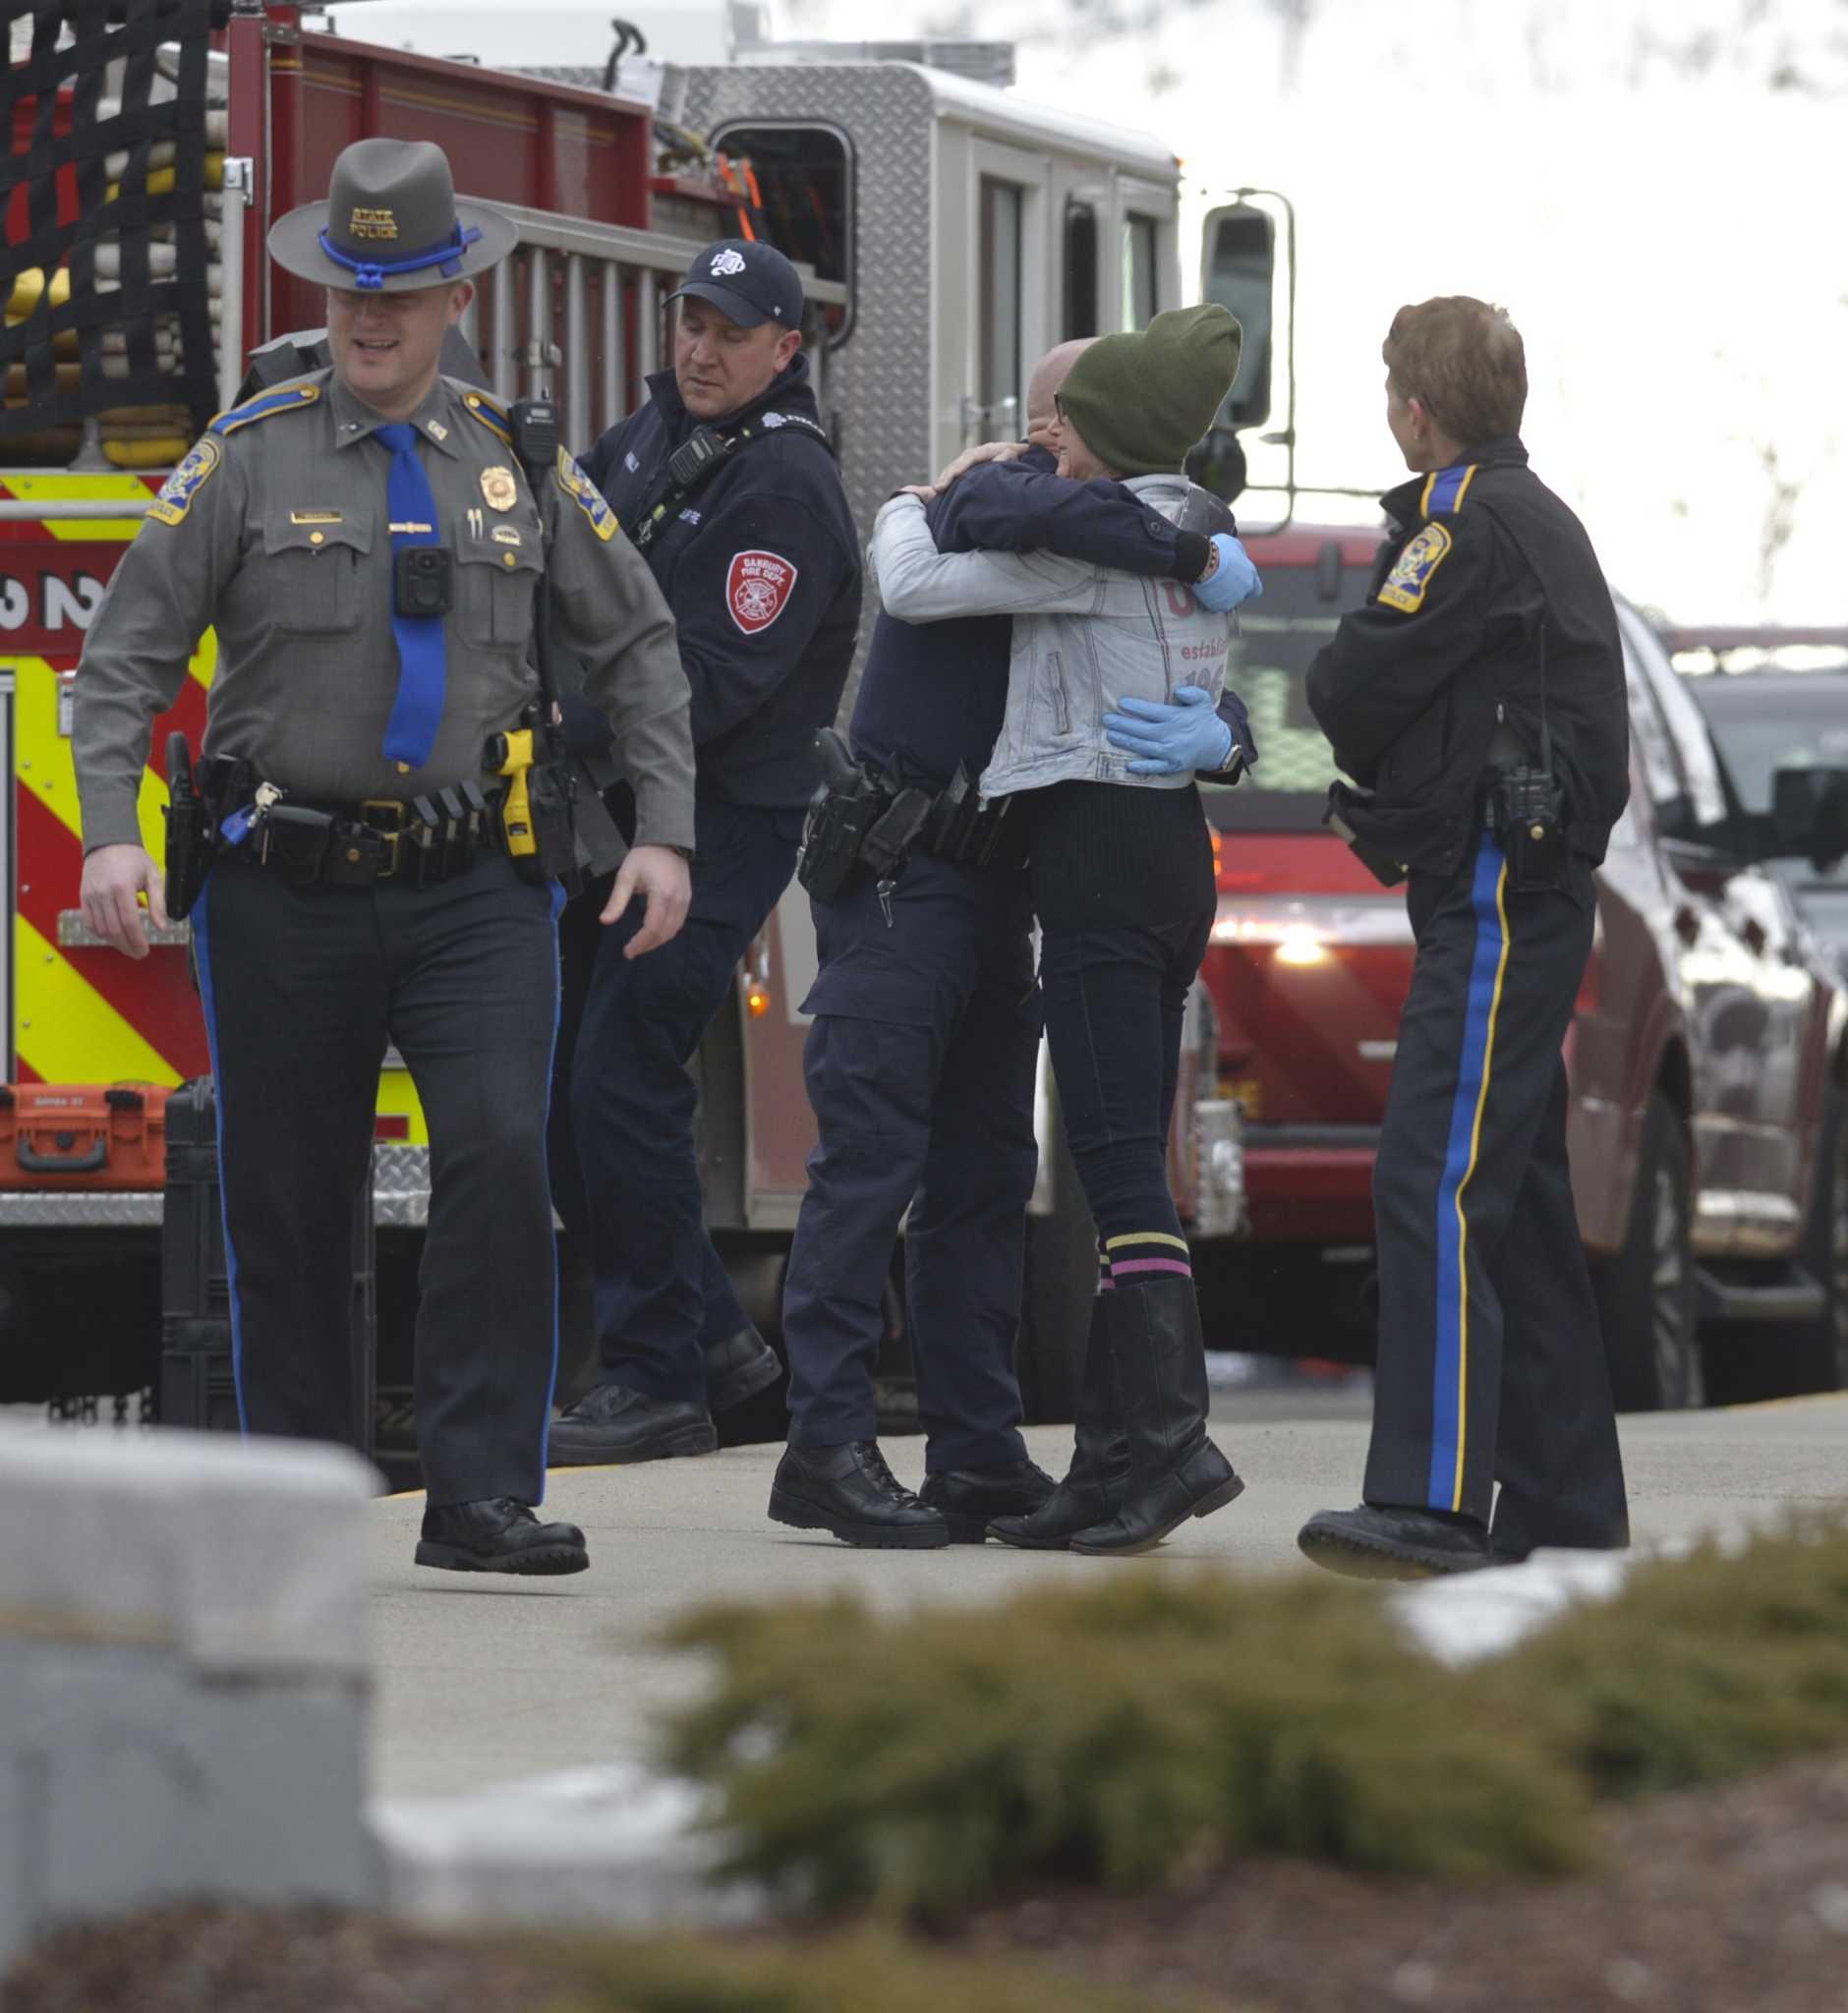 Tylenol caused courthouse evacuation in Danbury